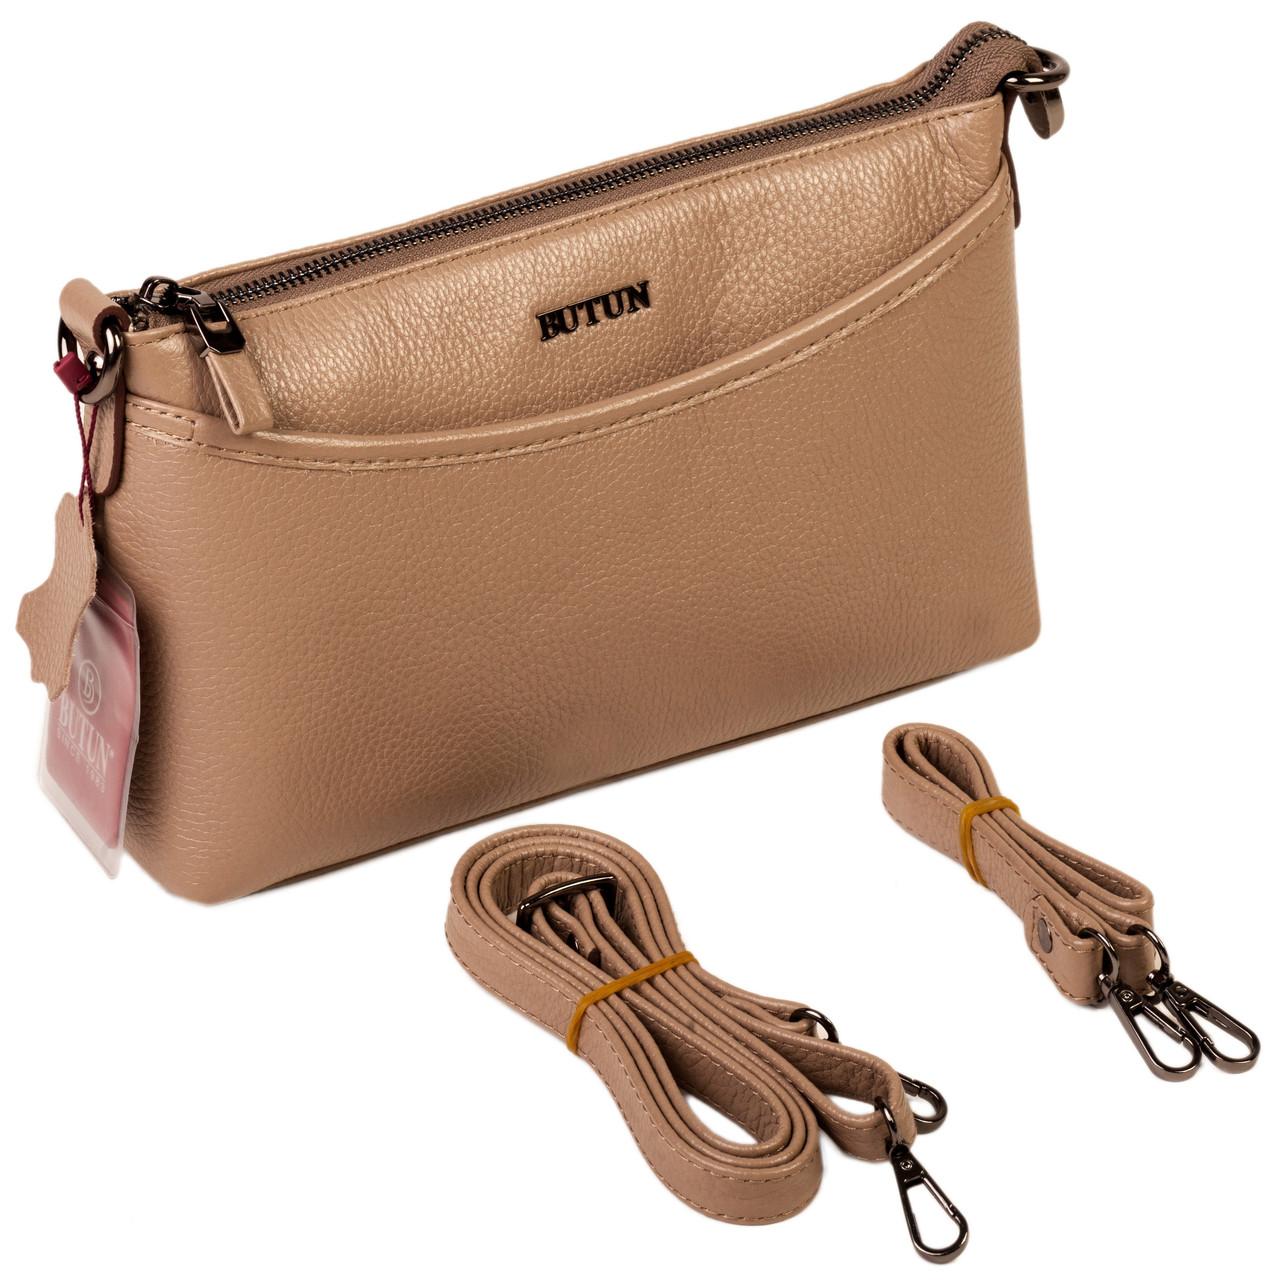 Женская сумка кожаная BUTUN 3107-004-015 кросс-боди бежевая